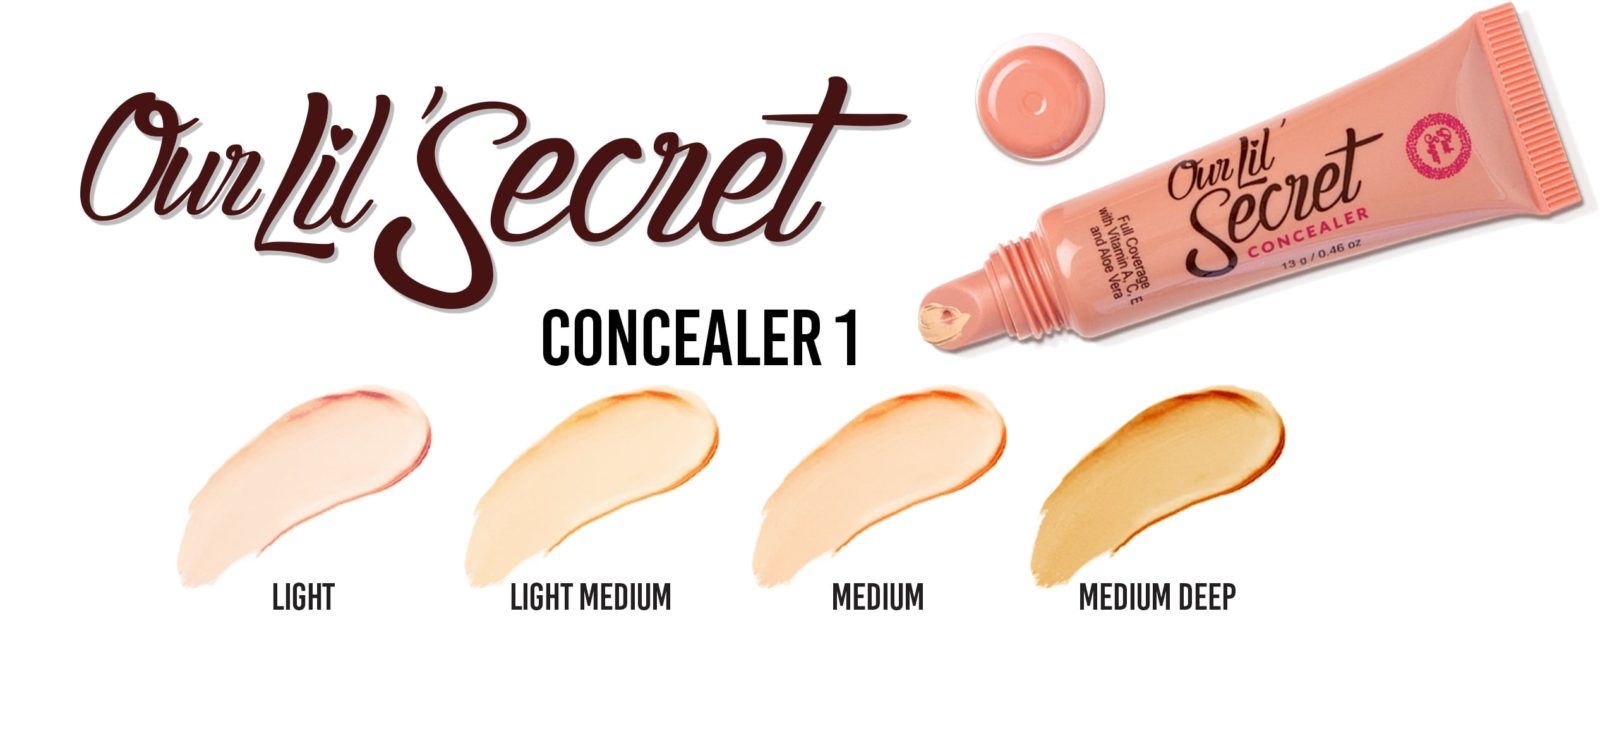 Our Lil' Secret Concealer Swatch Chart